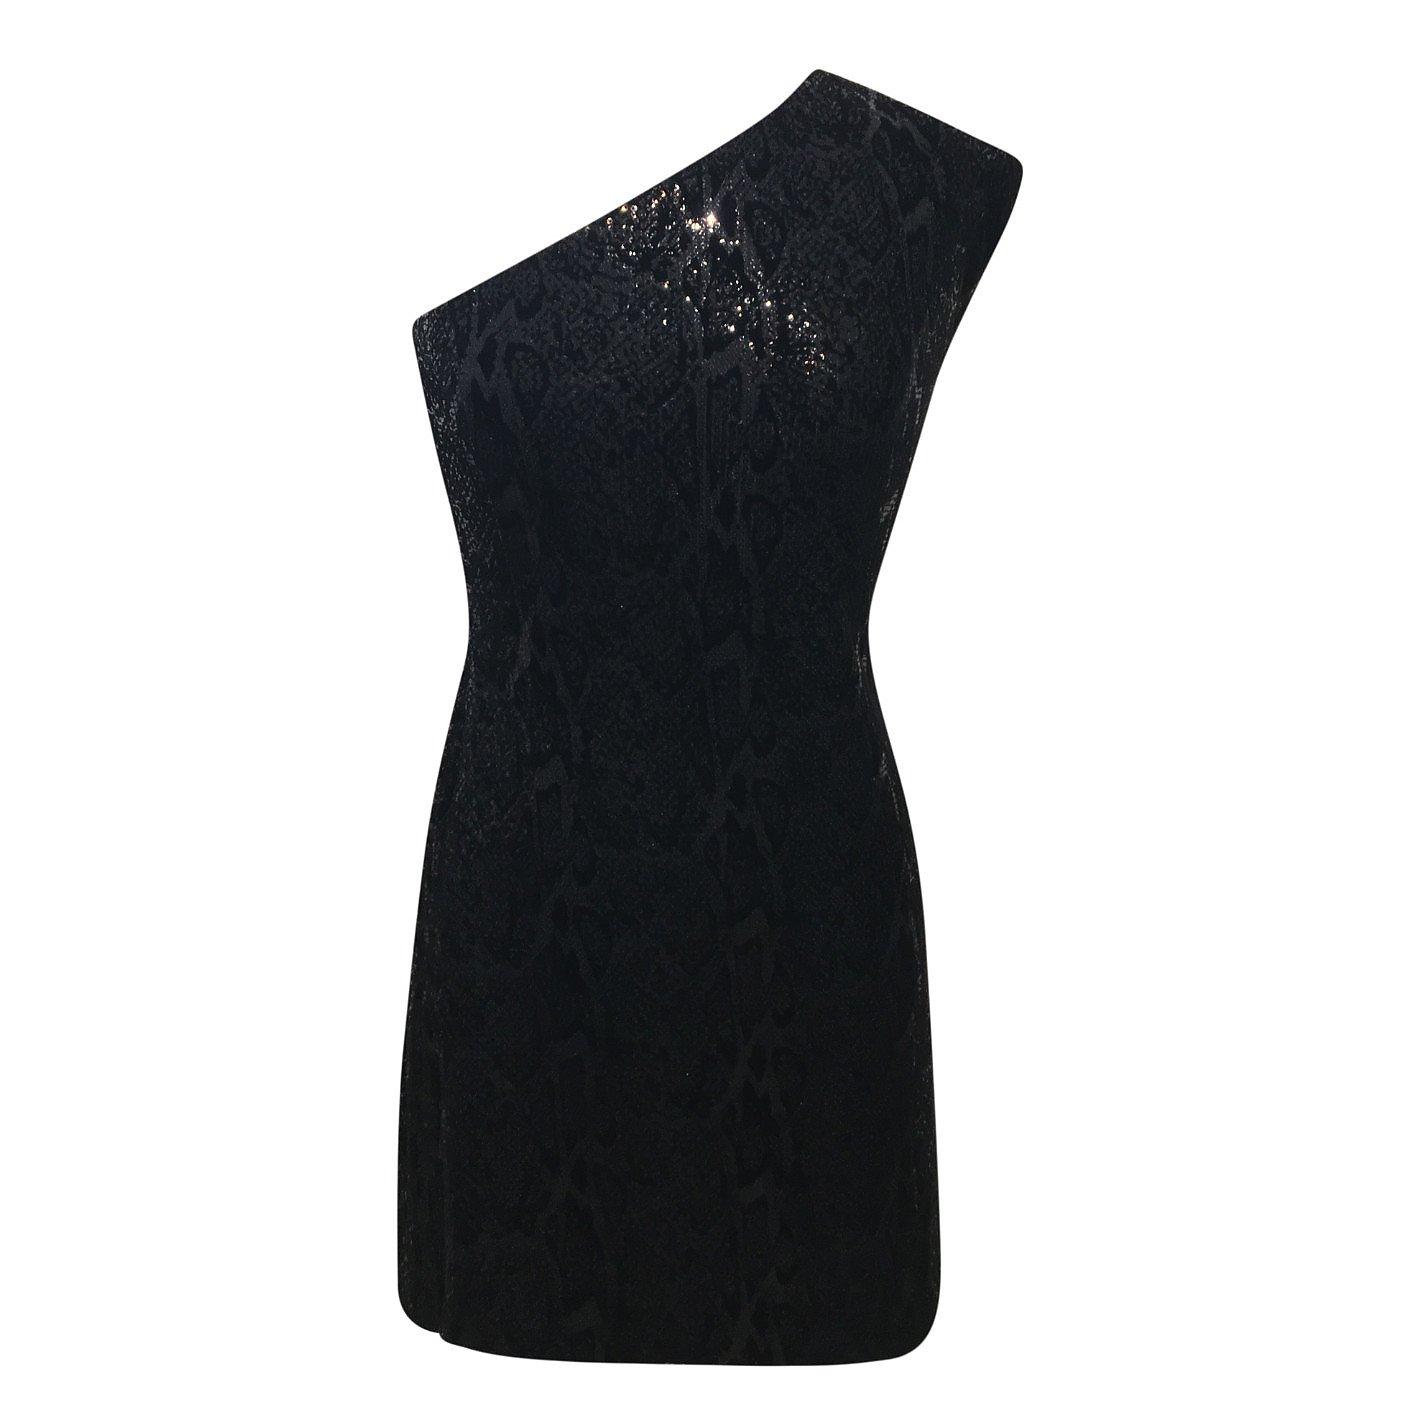 Halston Heritage One-Shoulder Sequin Dress